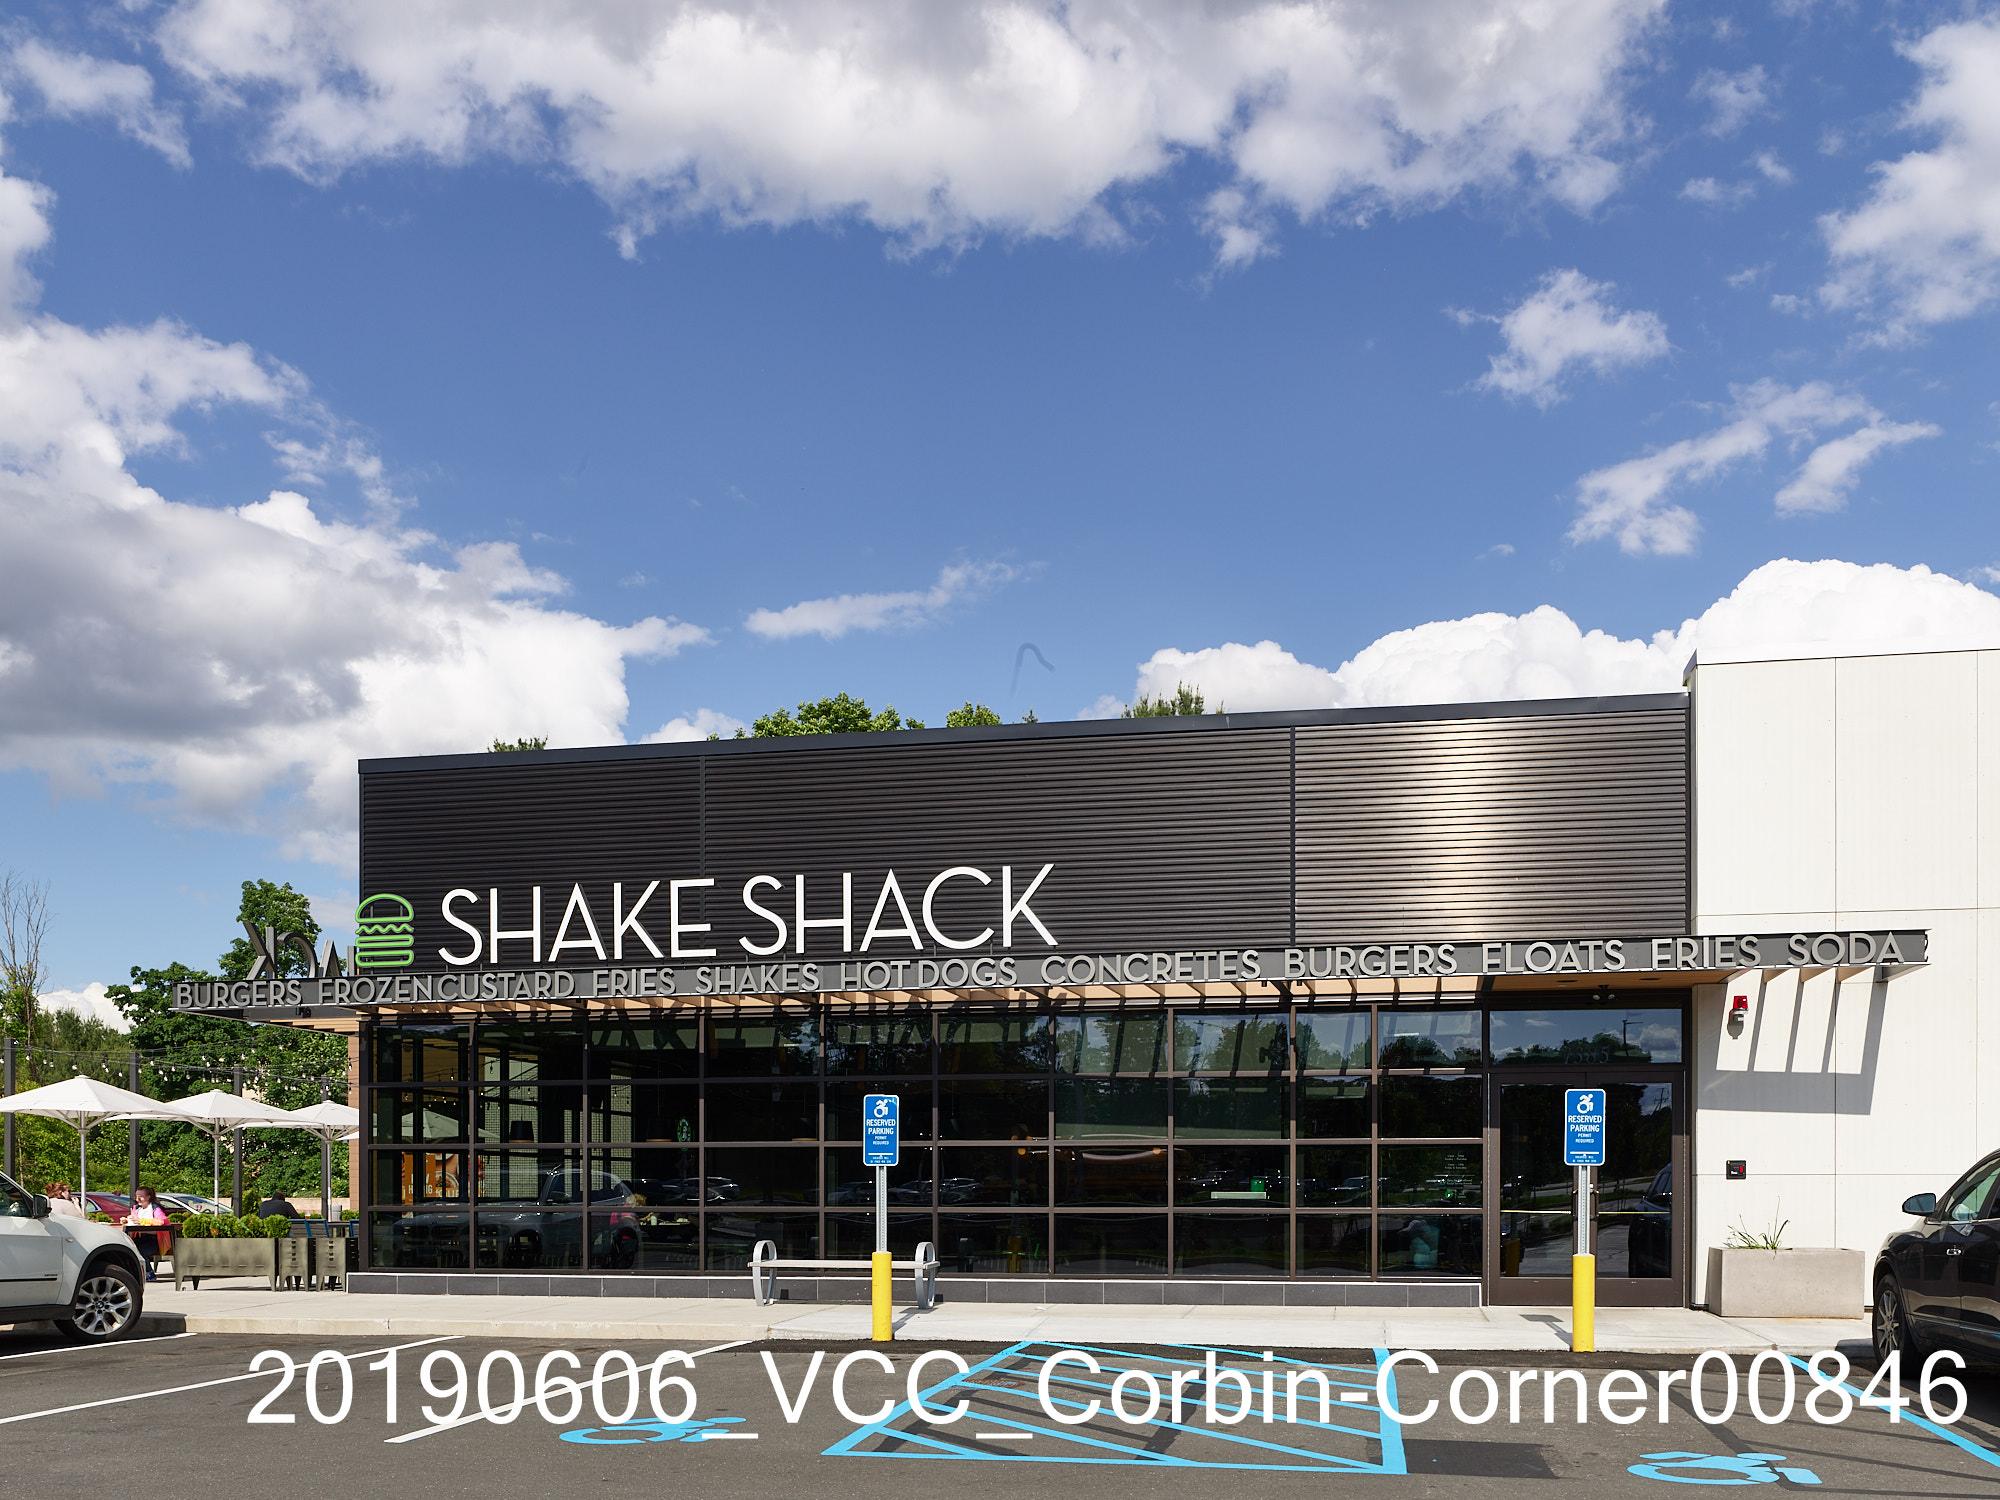 20190606_VCC_Corbin-Corner00846.jpg